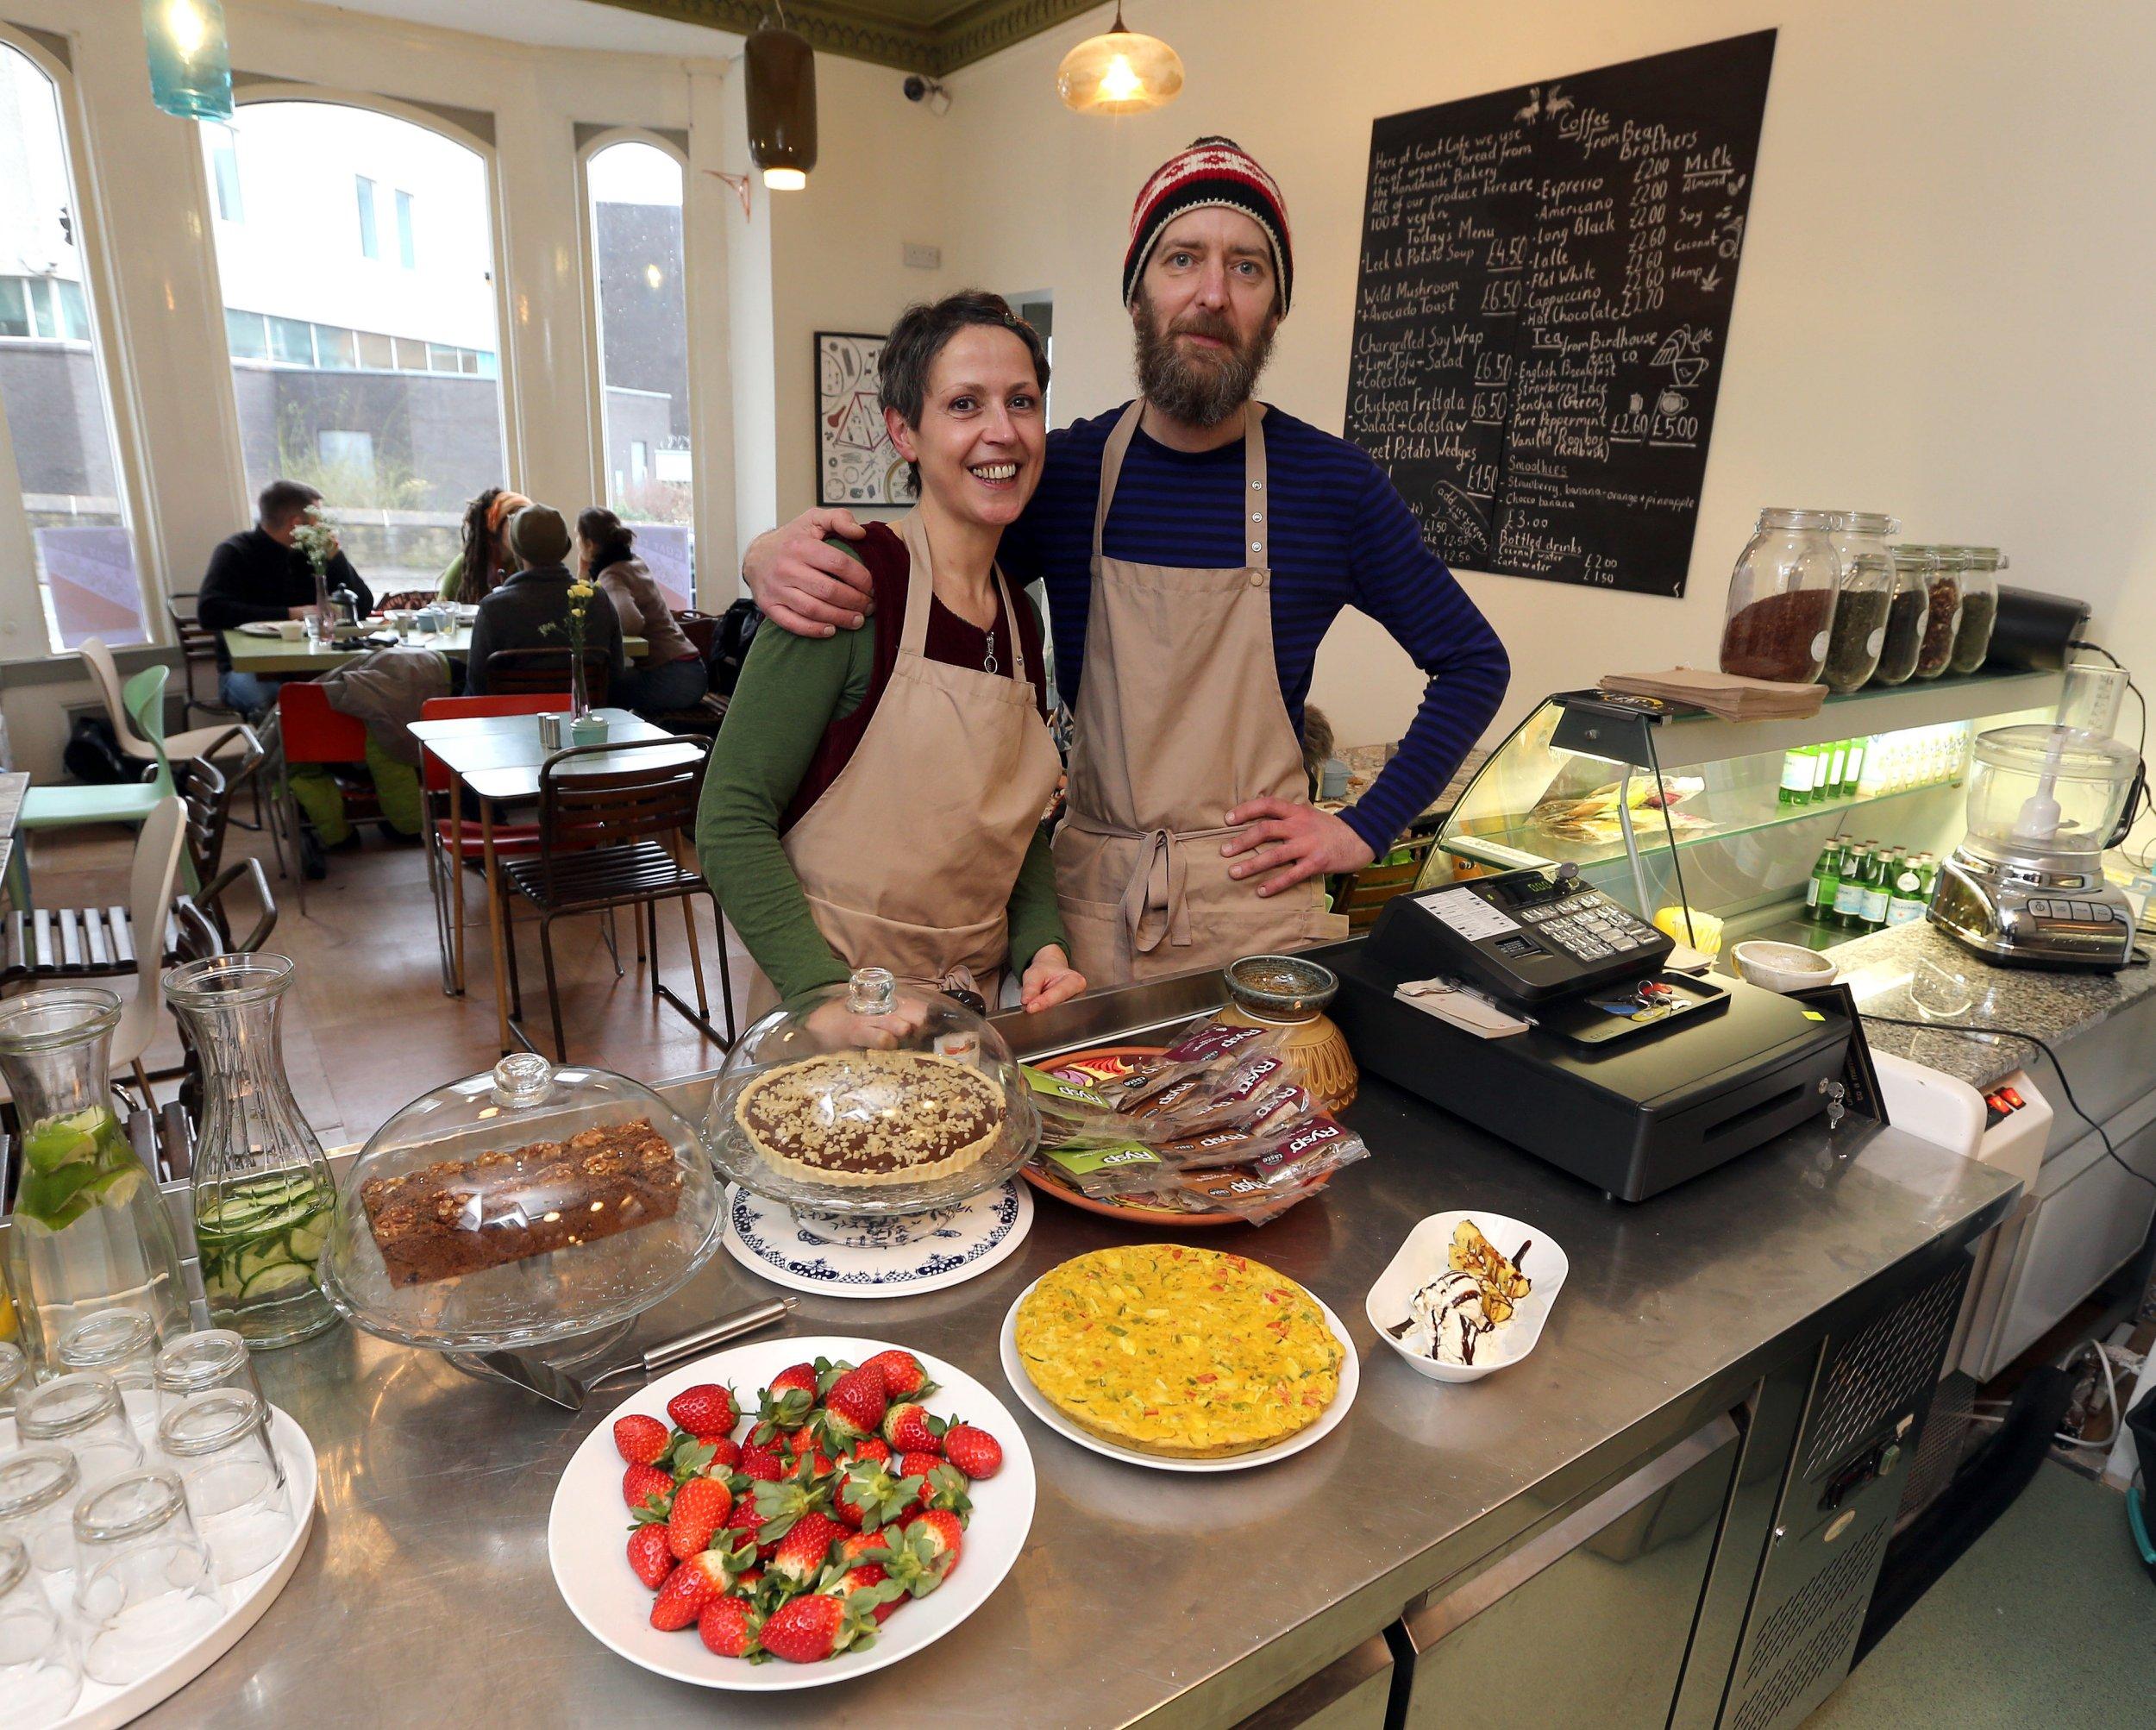 Dawn Silver and Matt Ward of Goat vegan cafe, 53, Trinity Street, Huddersfield.